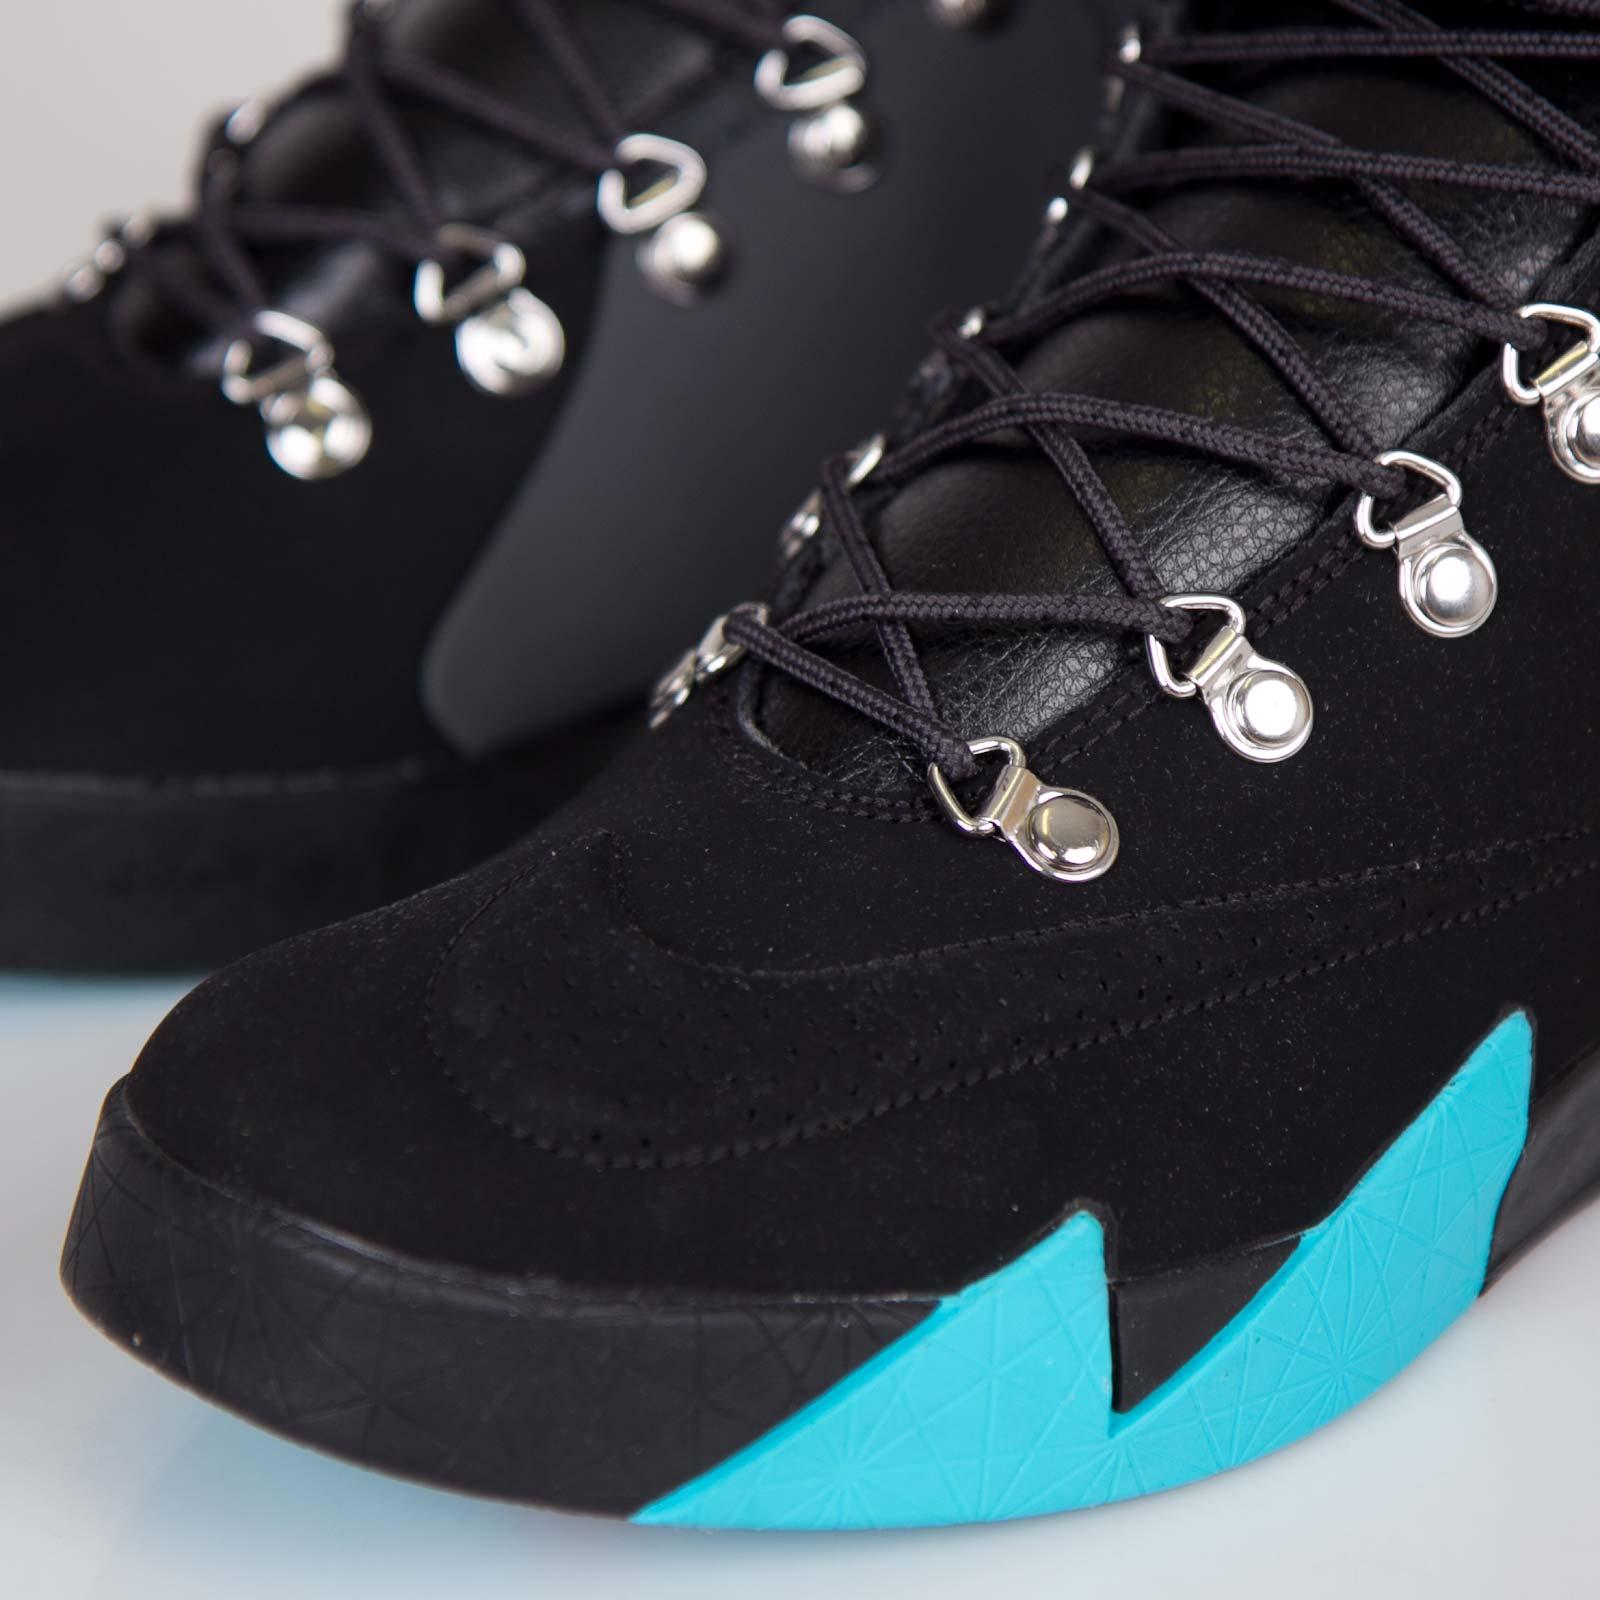 Hot Sale Nike KD 6 NSW Lifestyle Black Gamma Blue 621945-001